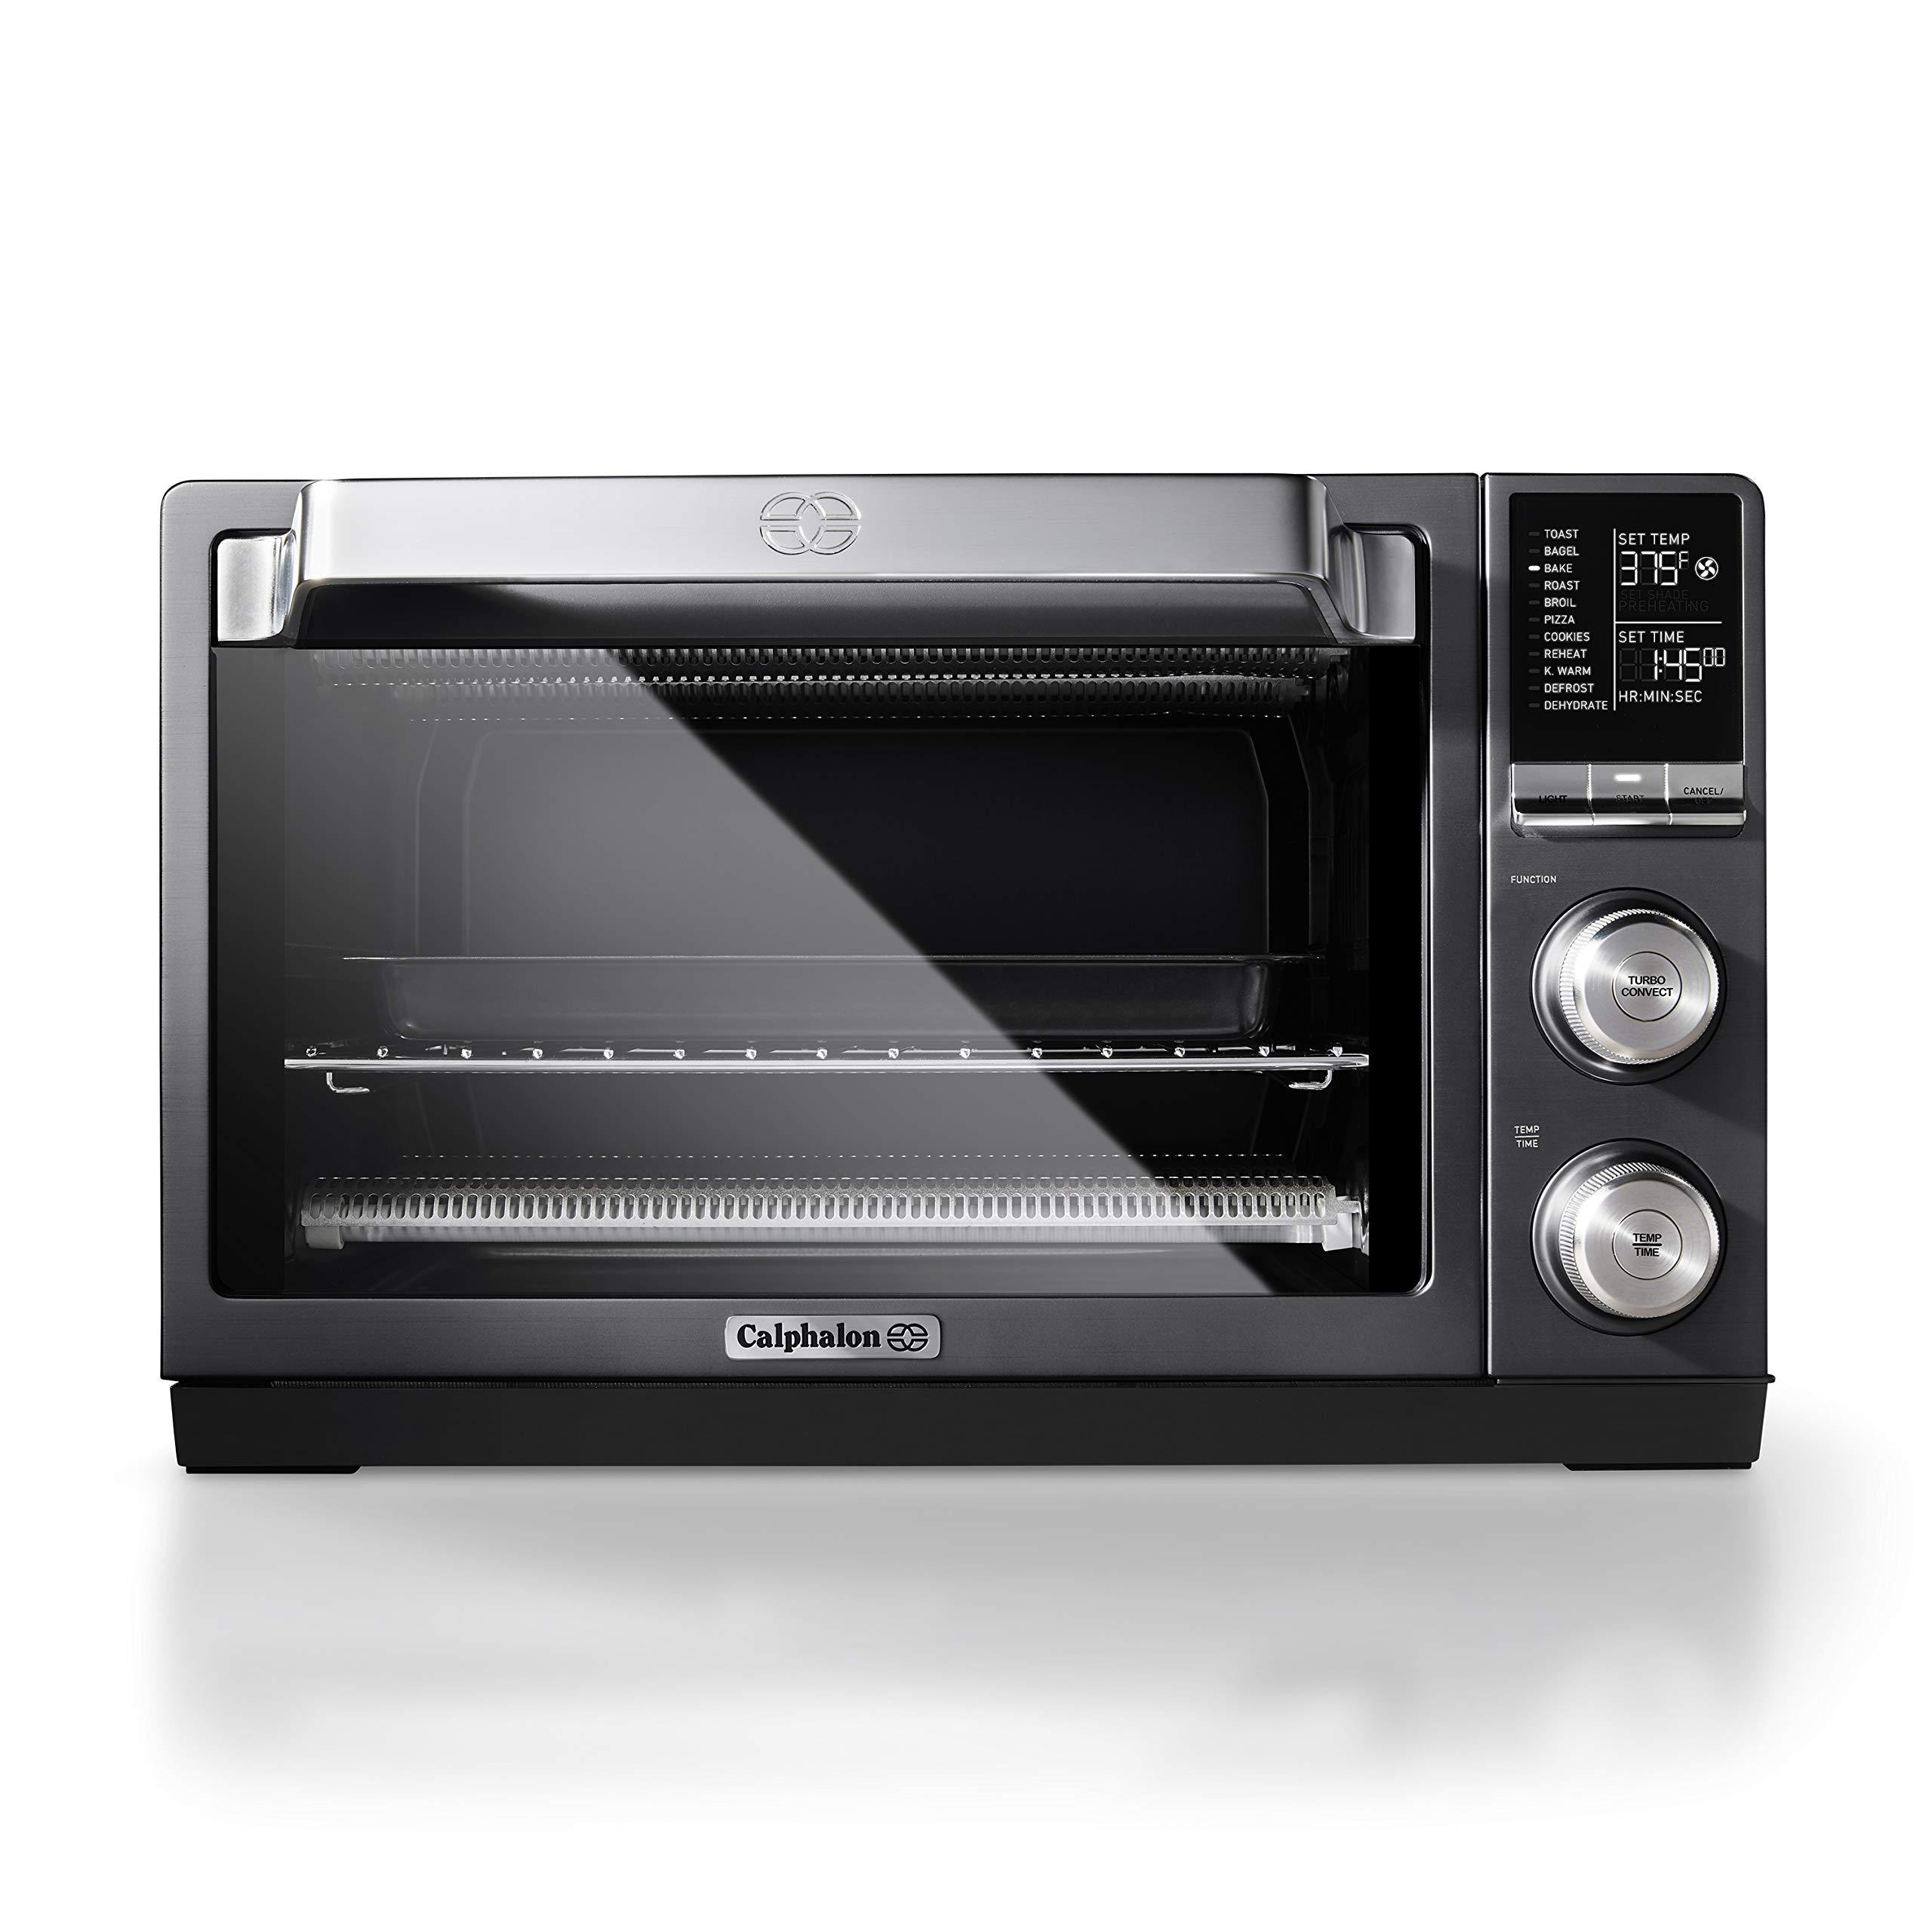 Calphalon TSCLTRDG1 Quartz Heat Countertop Toaster Oven, Stainless Steel, Extra-Large Capacity, Black, Dark Gray by Calphalon